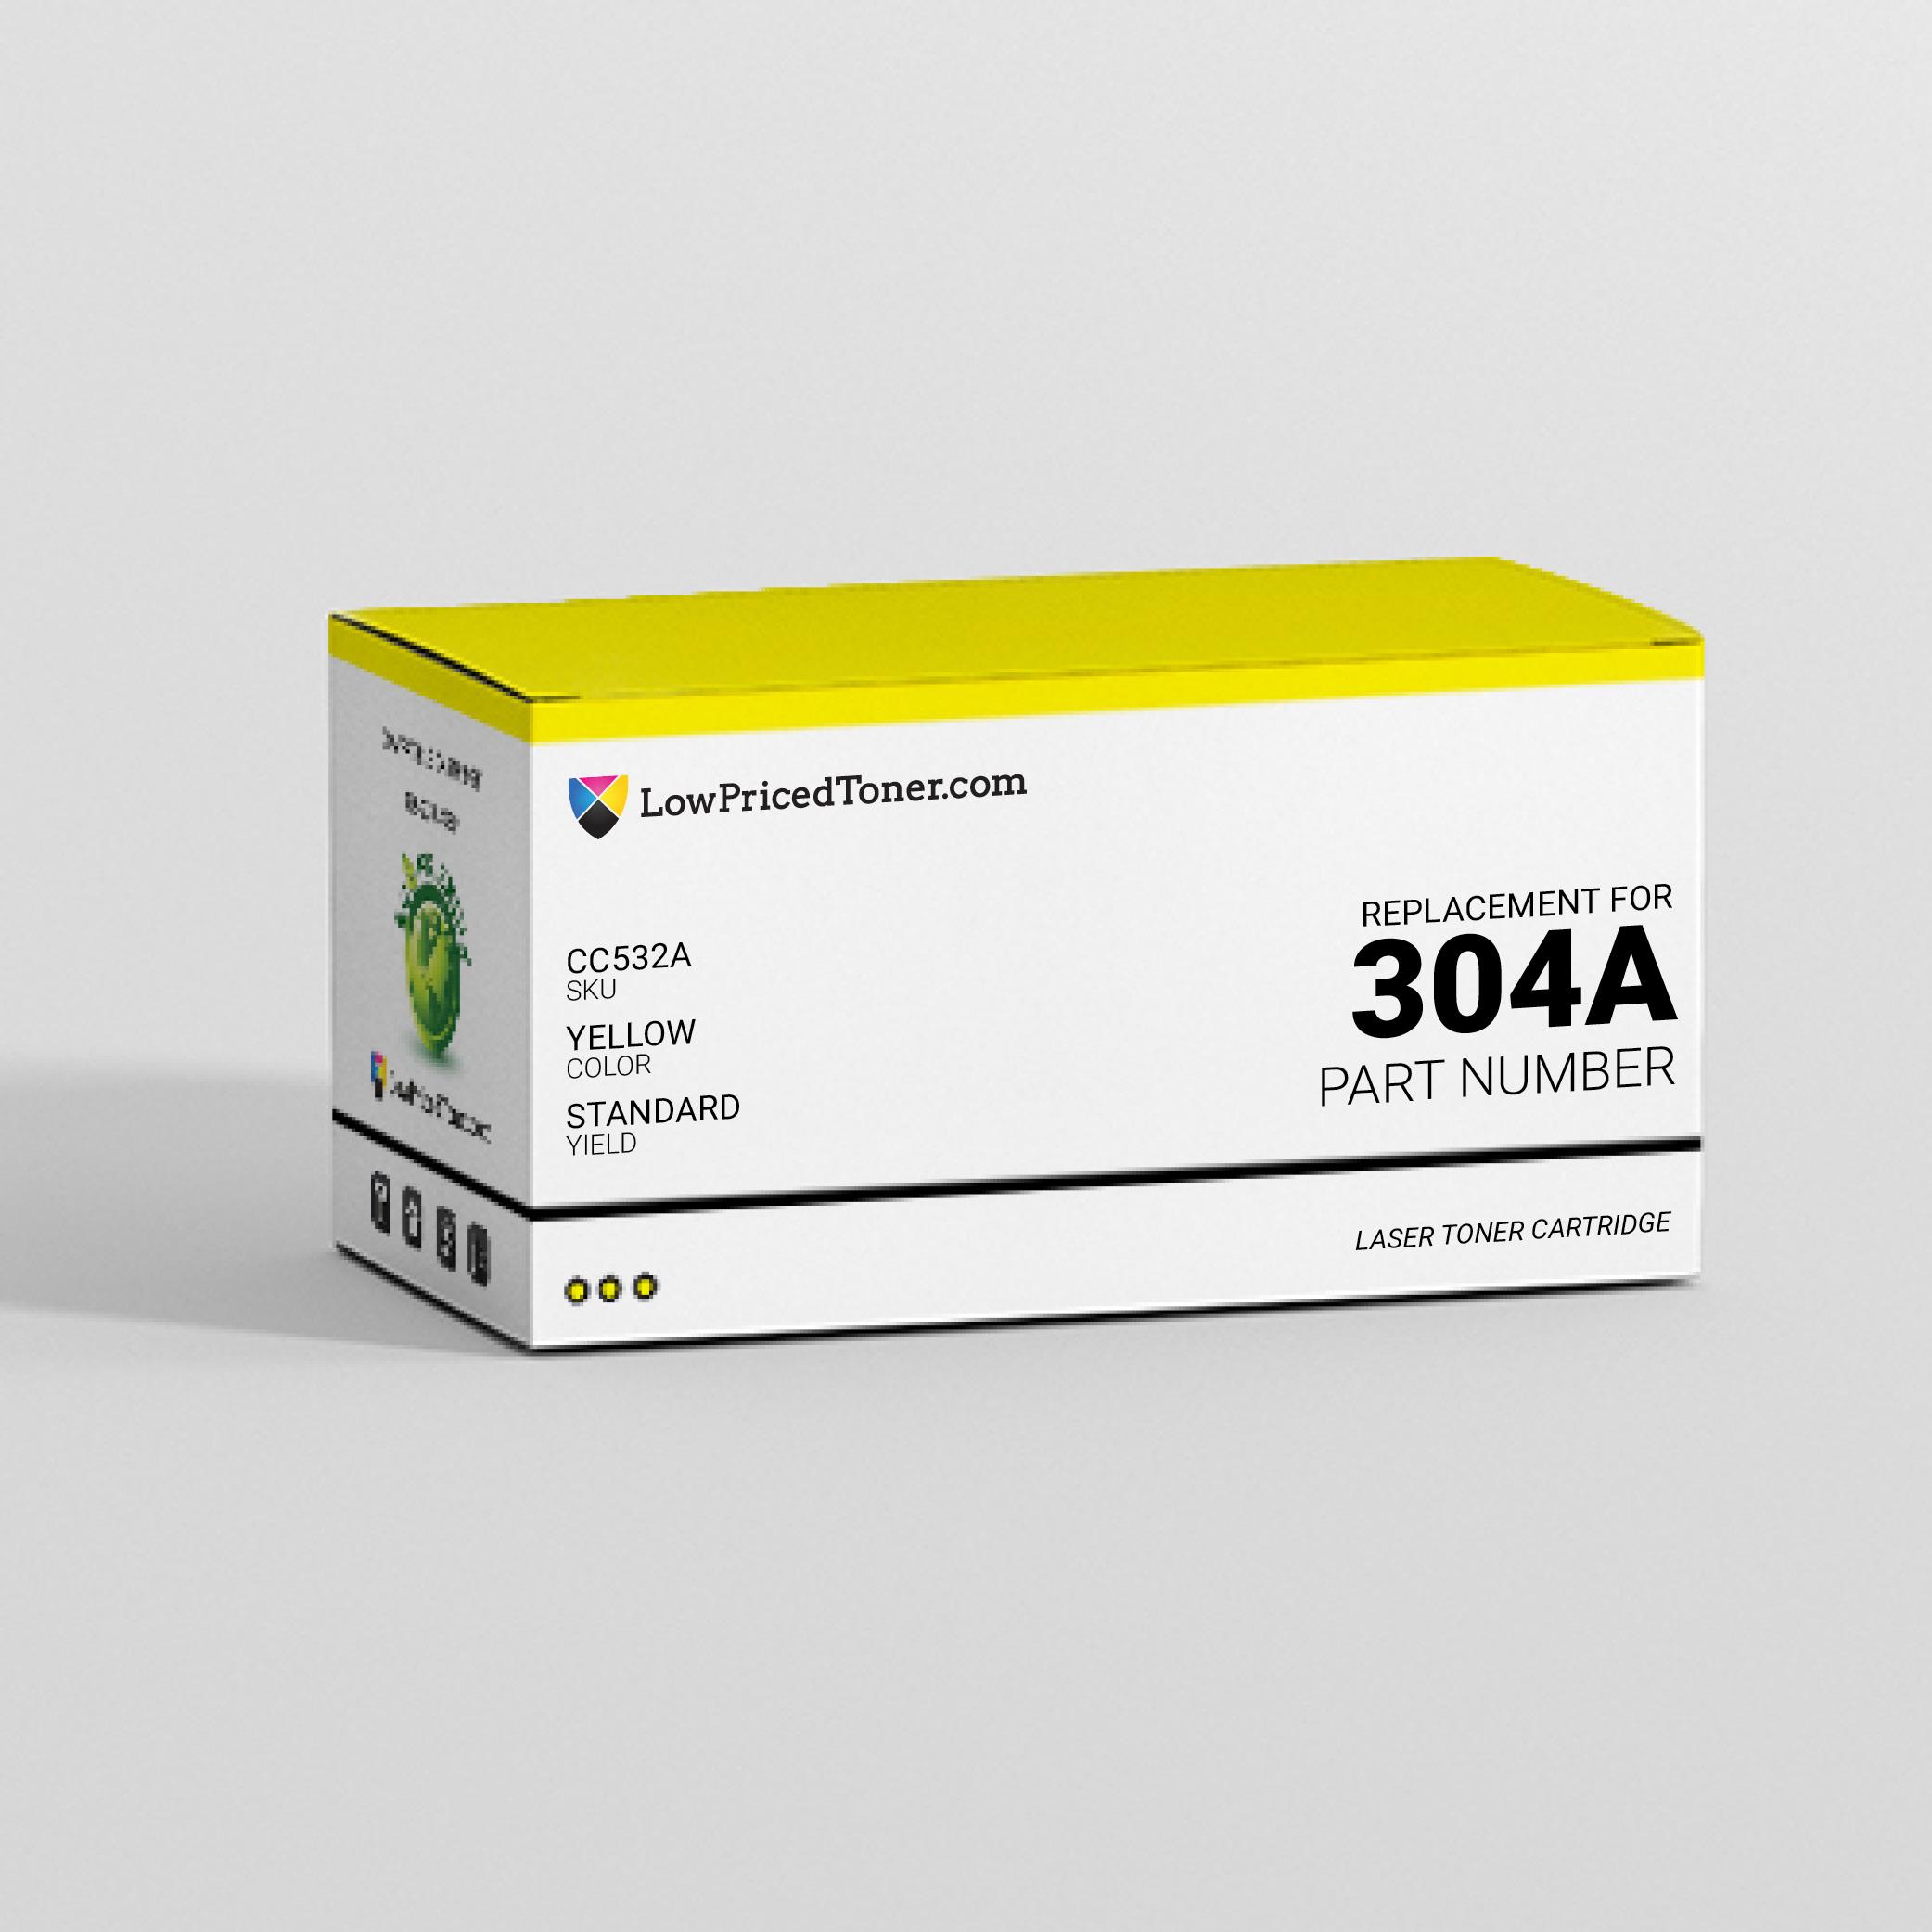 HP CC532A 304A Compatible Yellow Laser Toner Cartridge